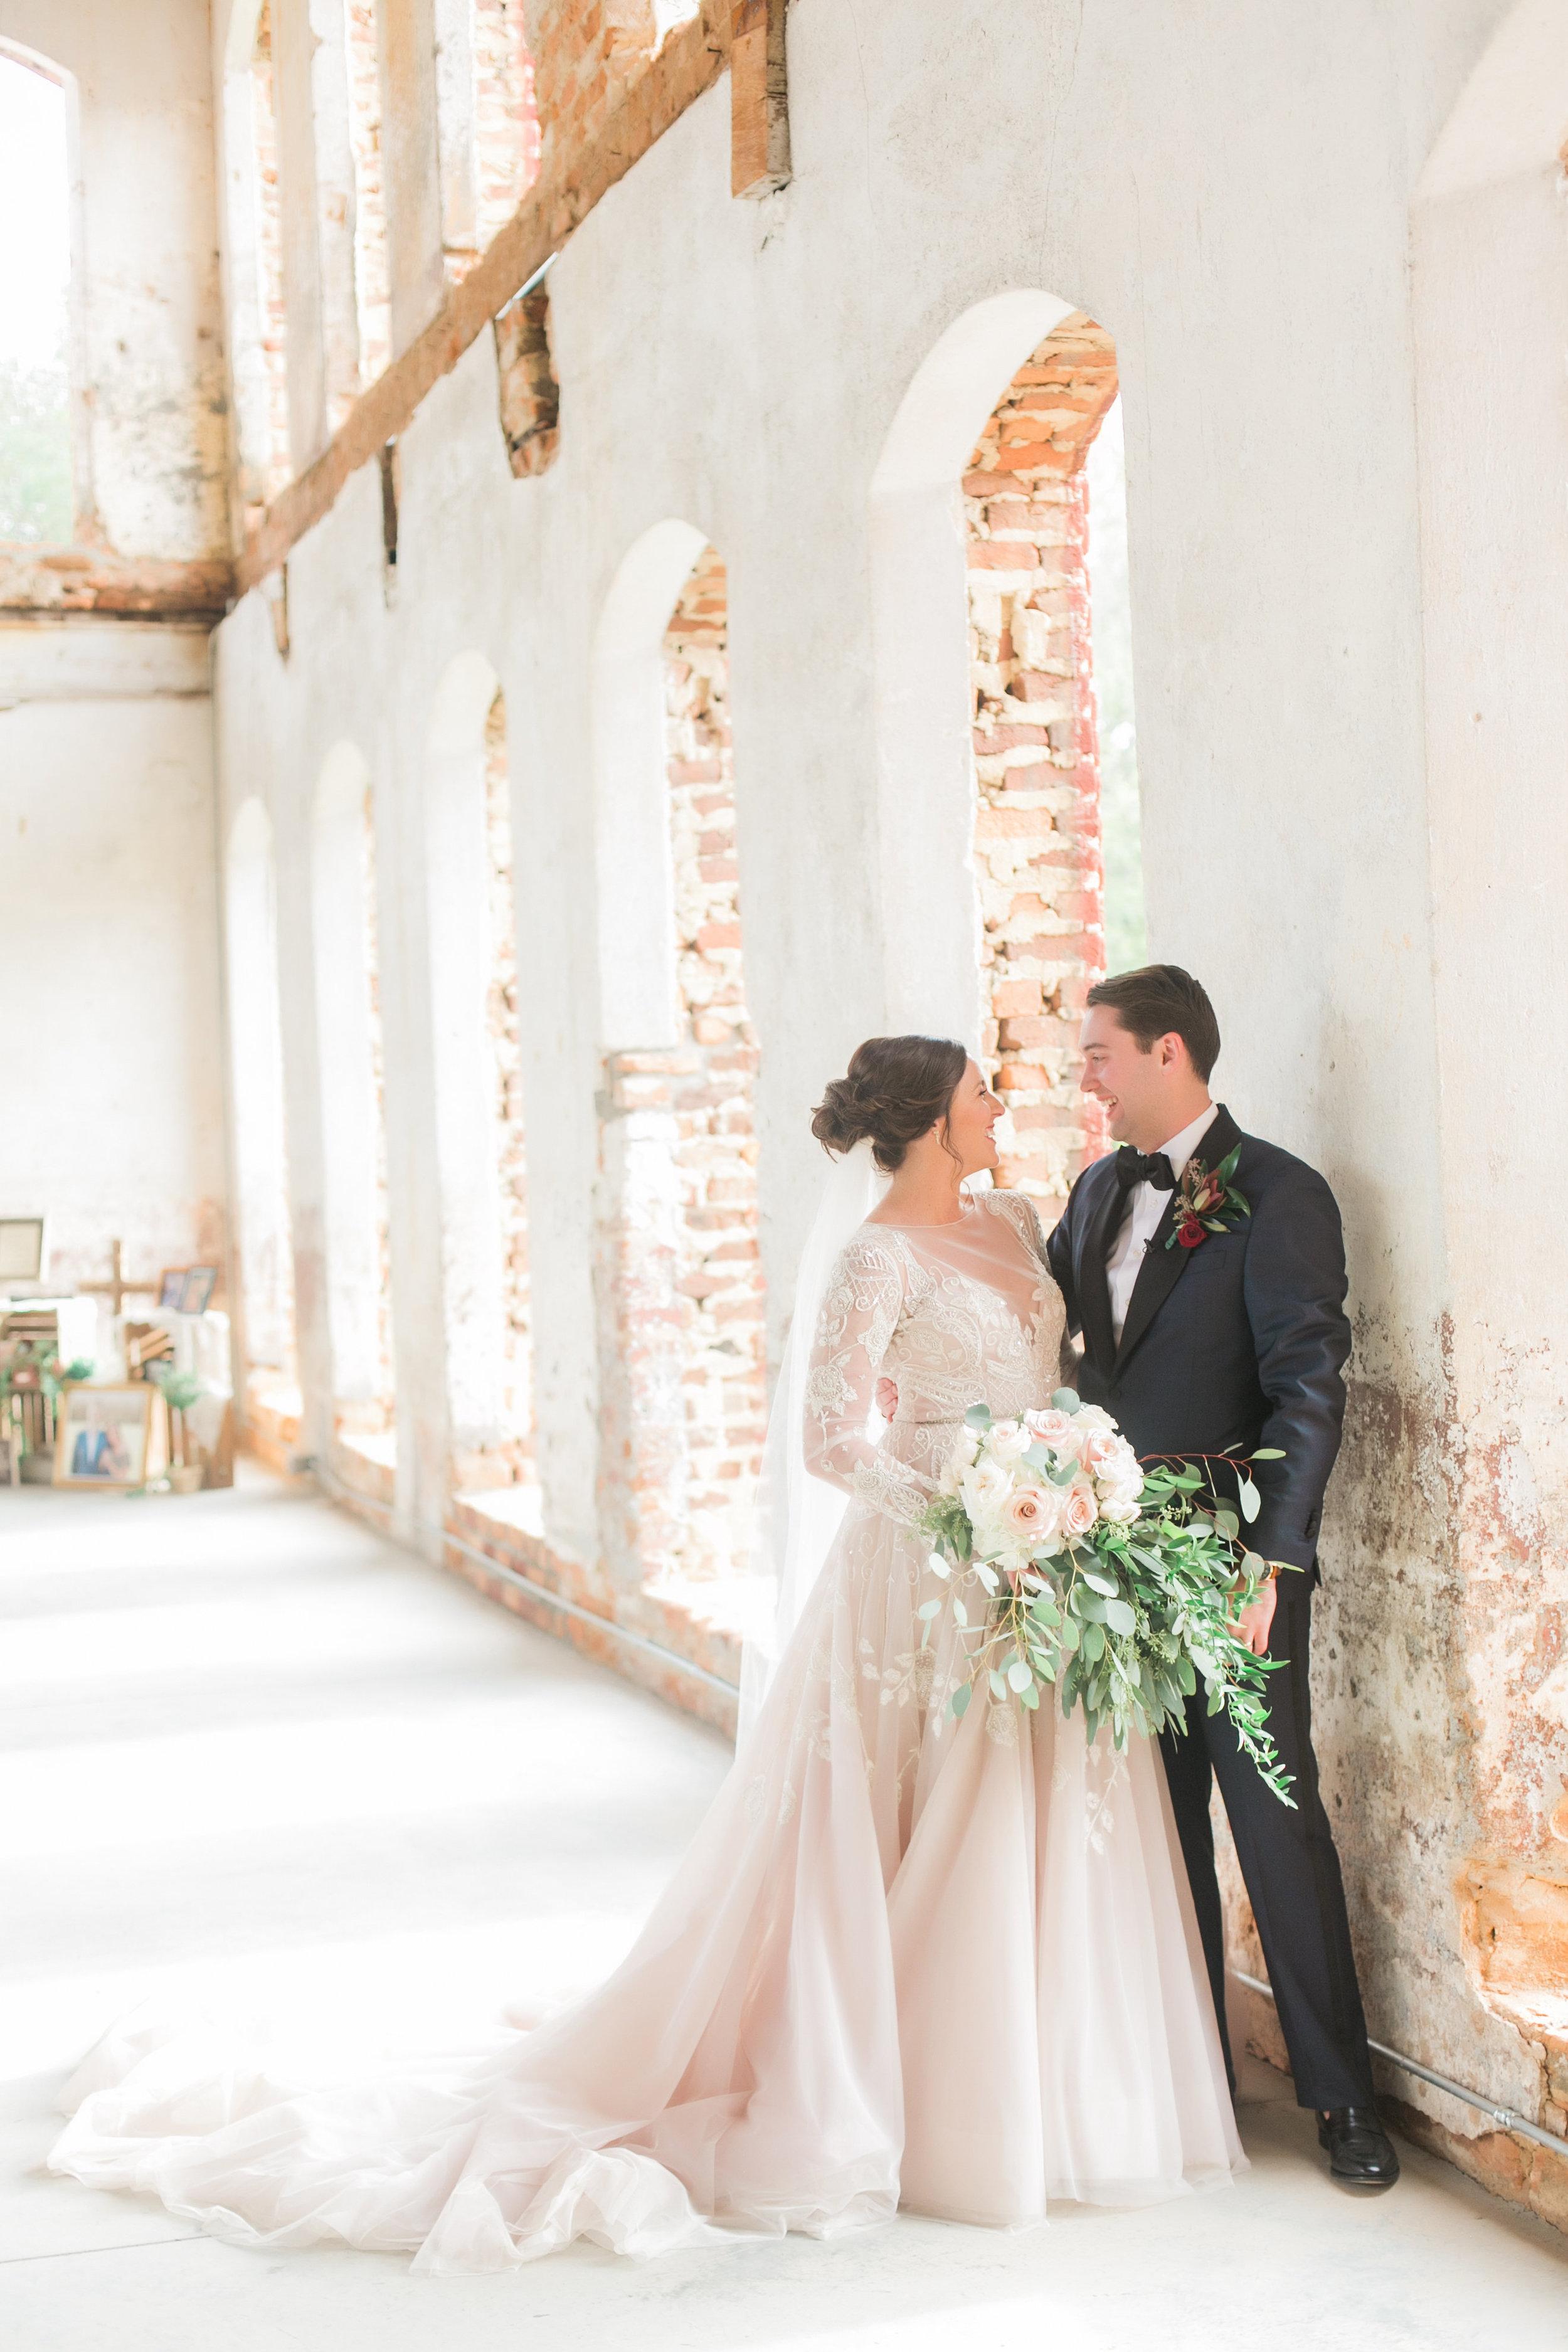 North Carolina Providence Cotton Mill Wedding — Vintage Wedding Decor Details - The Overwhelmed Bride Wedding Blog